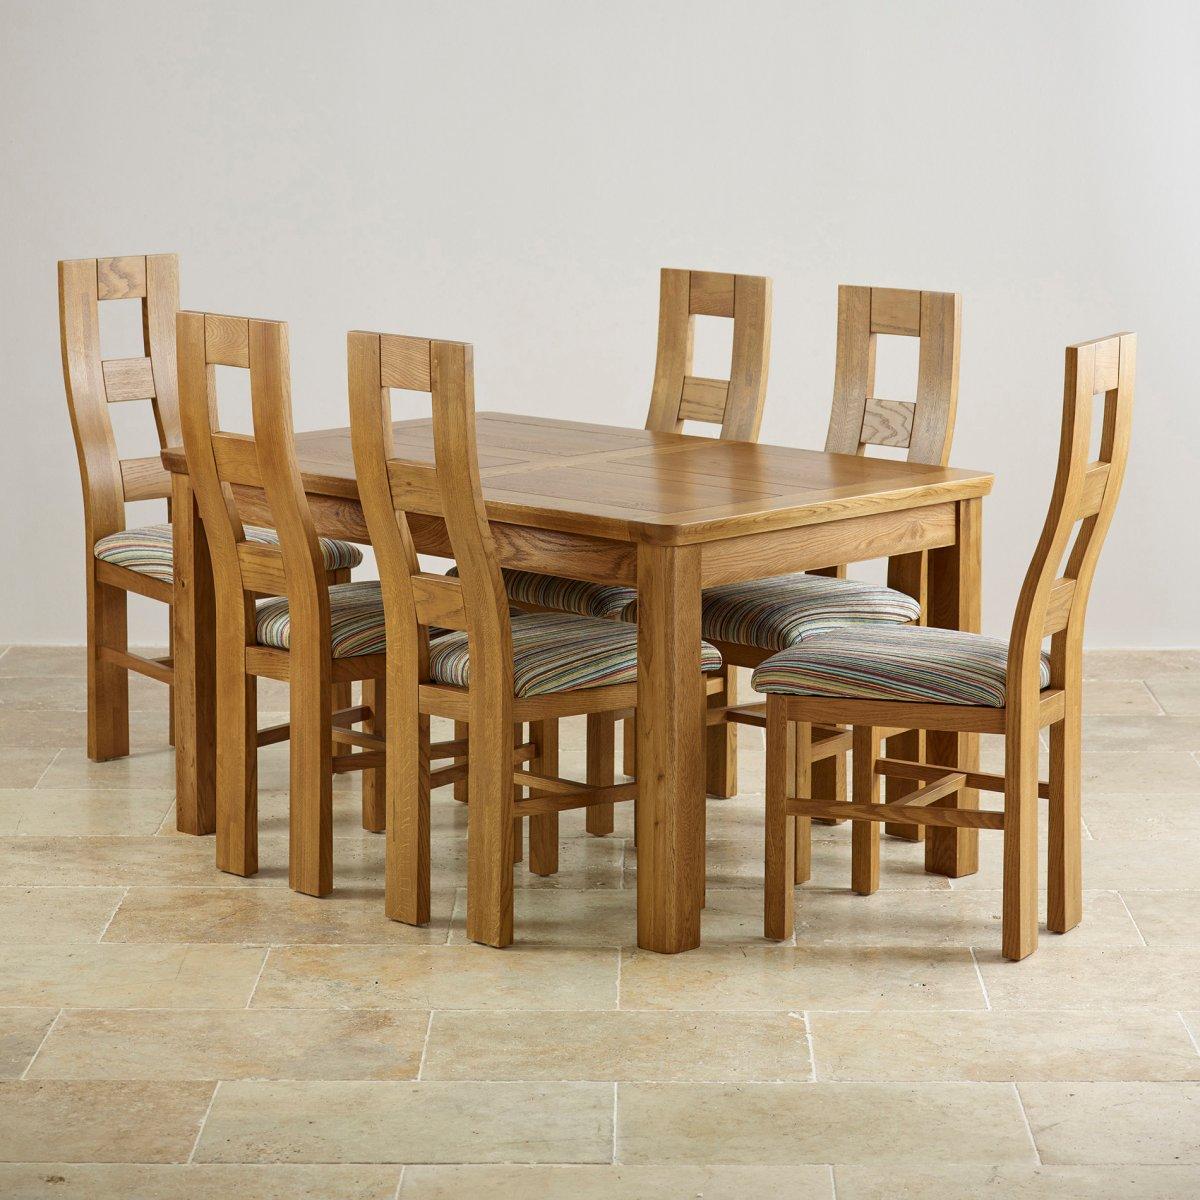 Dining Table 6: Orrick Extending Dining Set In Rustic Oak: Table + 6 Beige